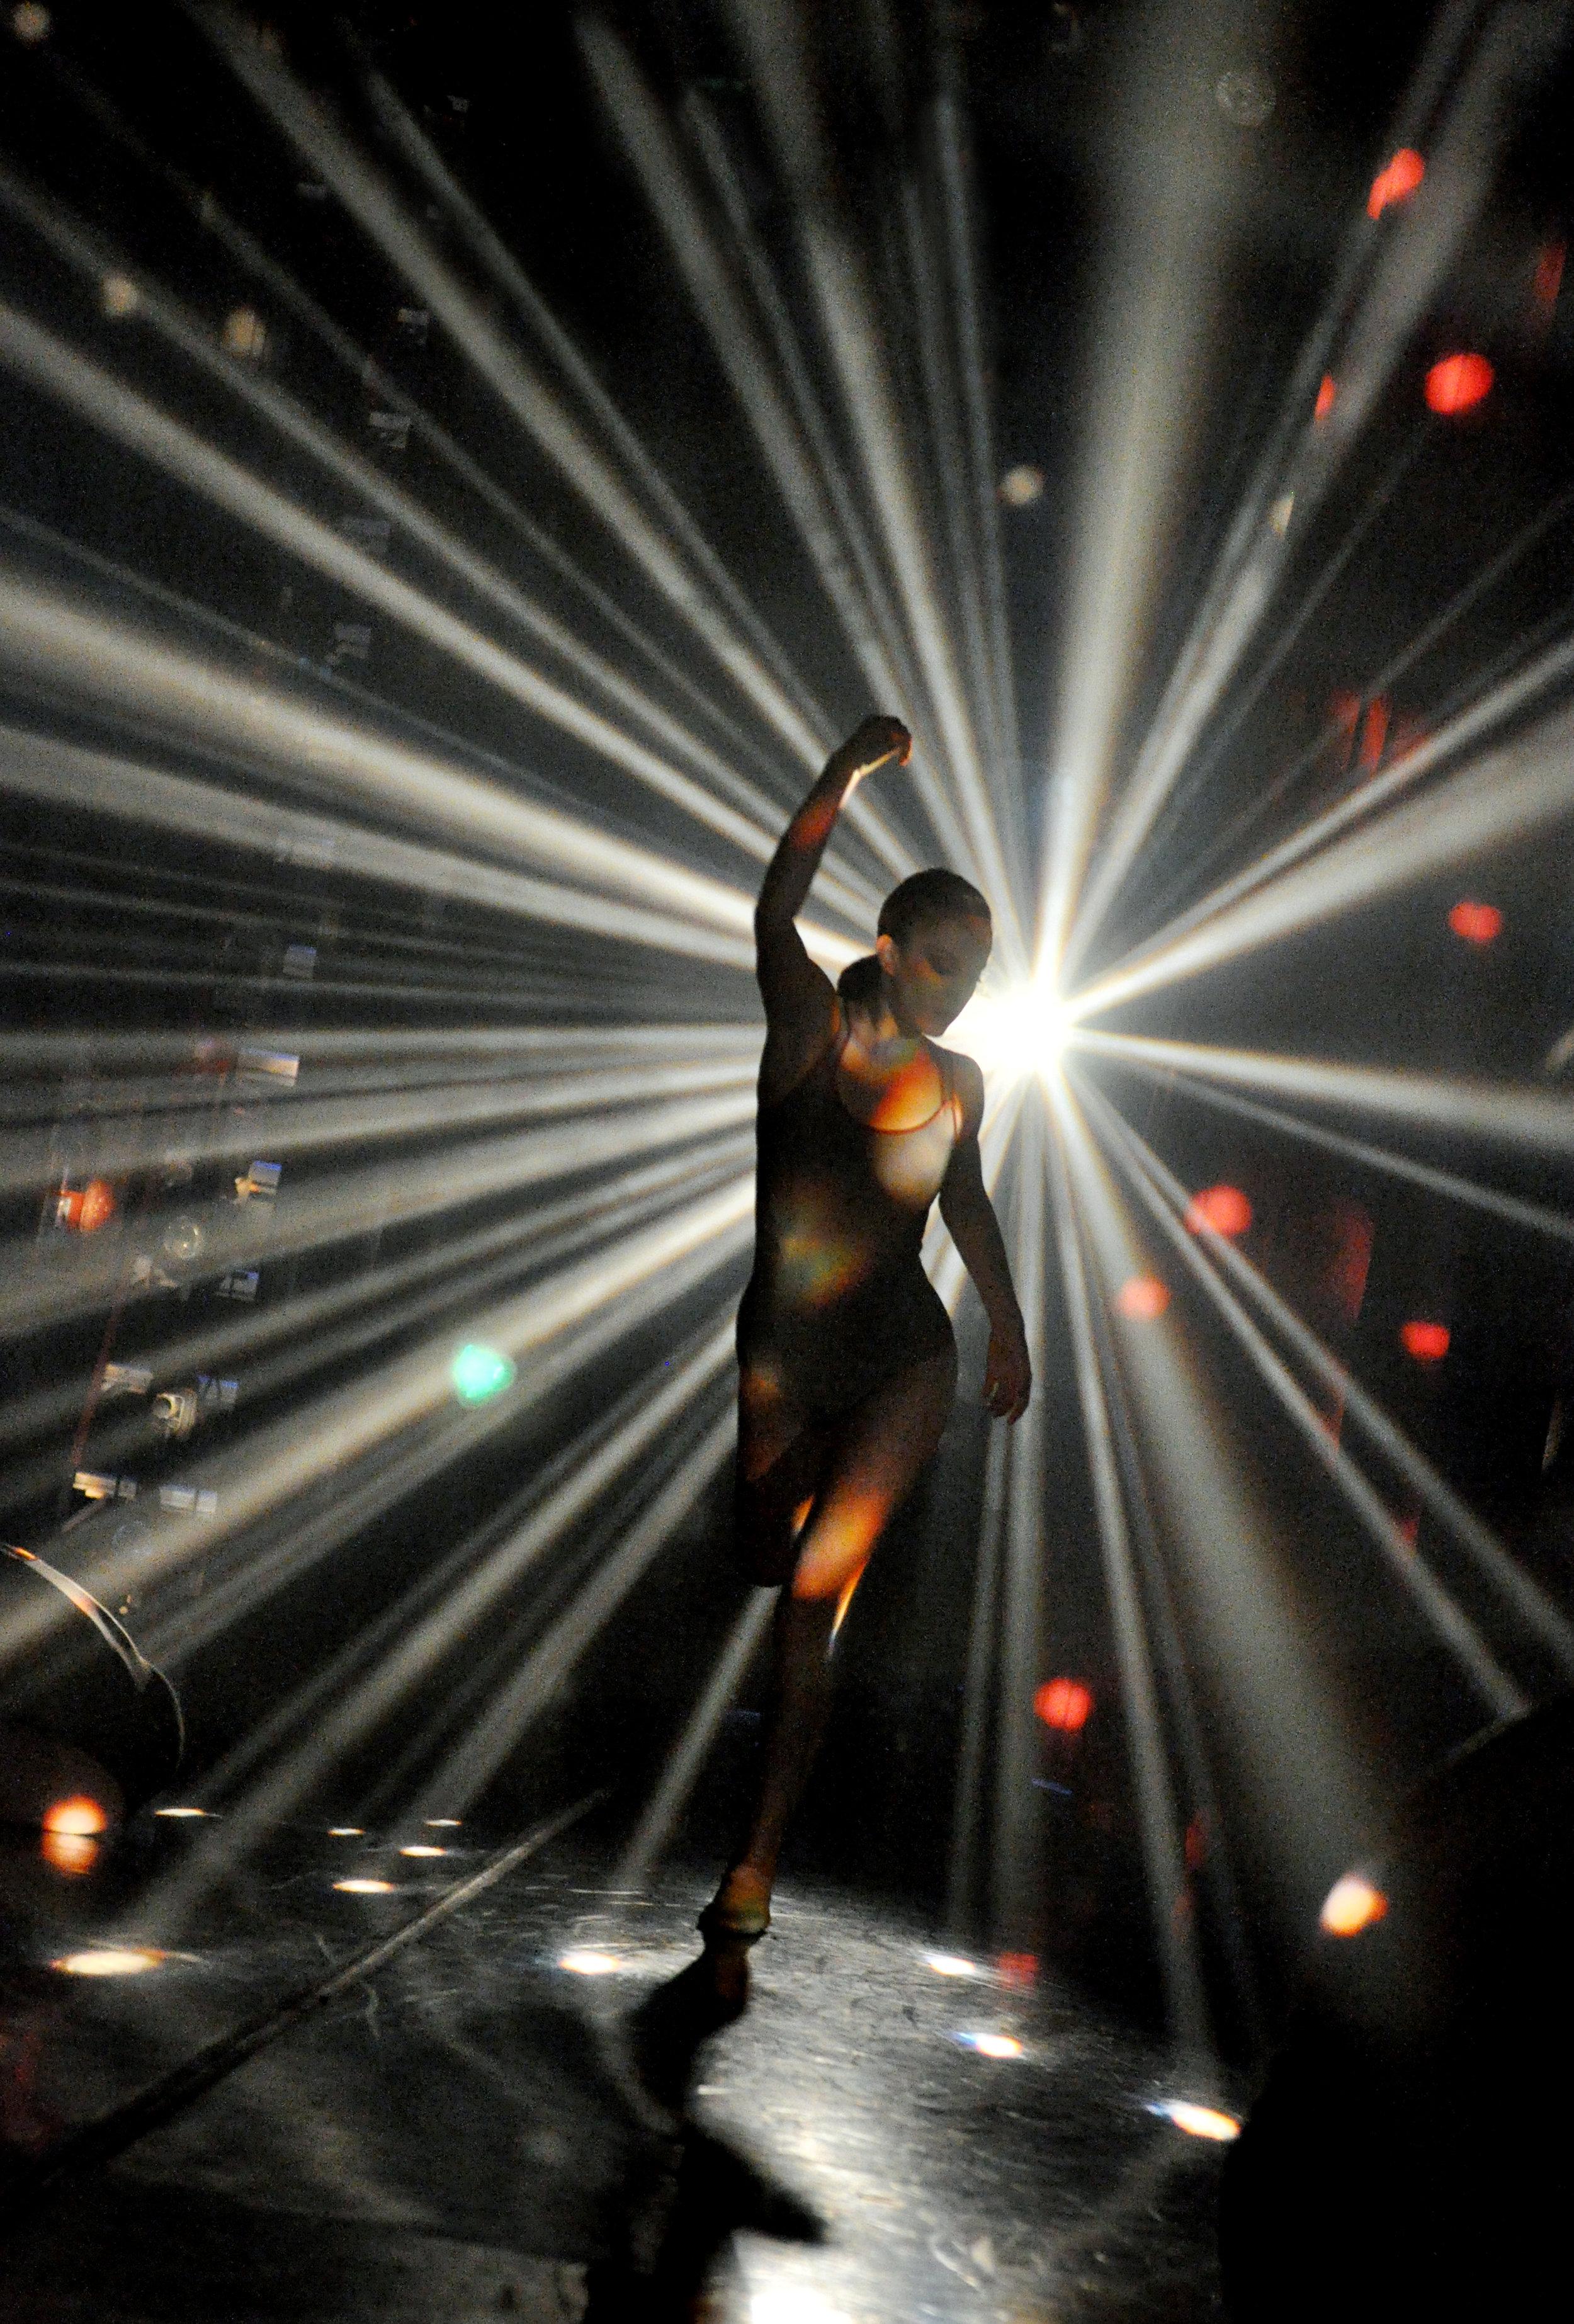 Alessandra Ball in Dekkers'  Milieu,  lighting design by David Robertson, photo by Natalia Perez